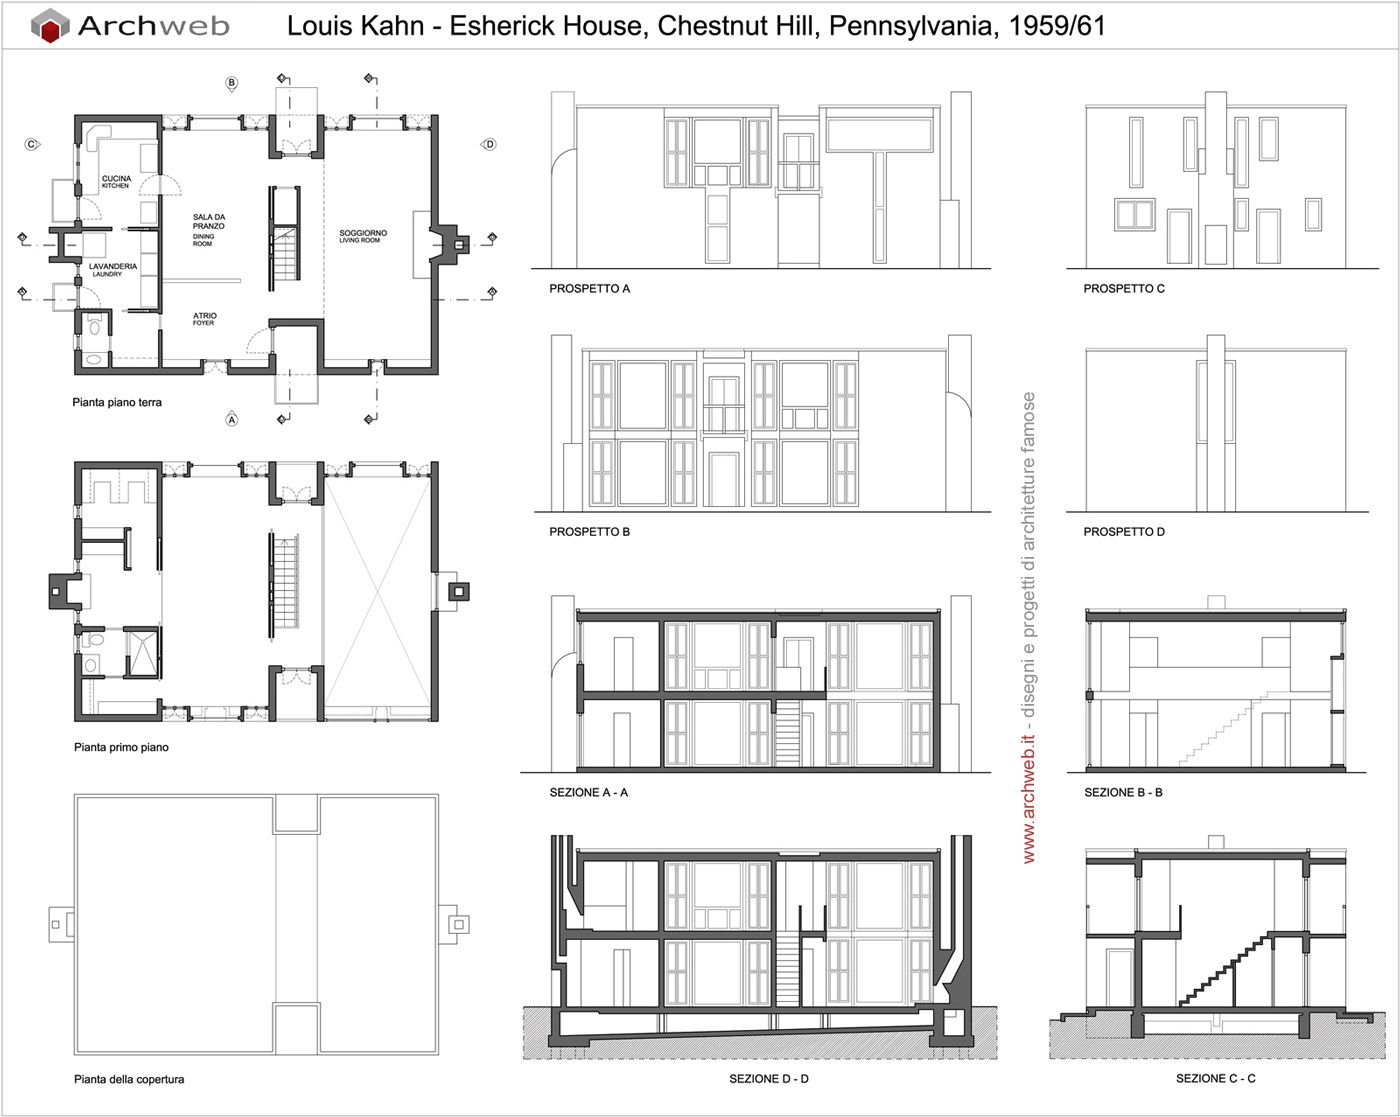 Esherick house dwg drawings noussi pinterest for Dwg house plans